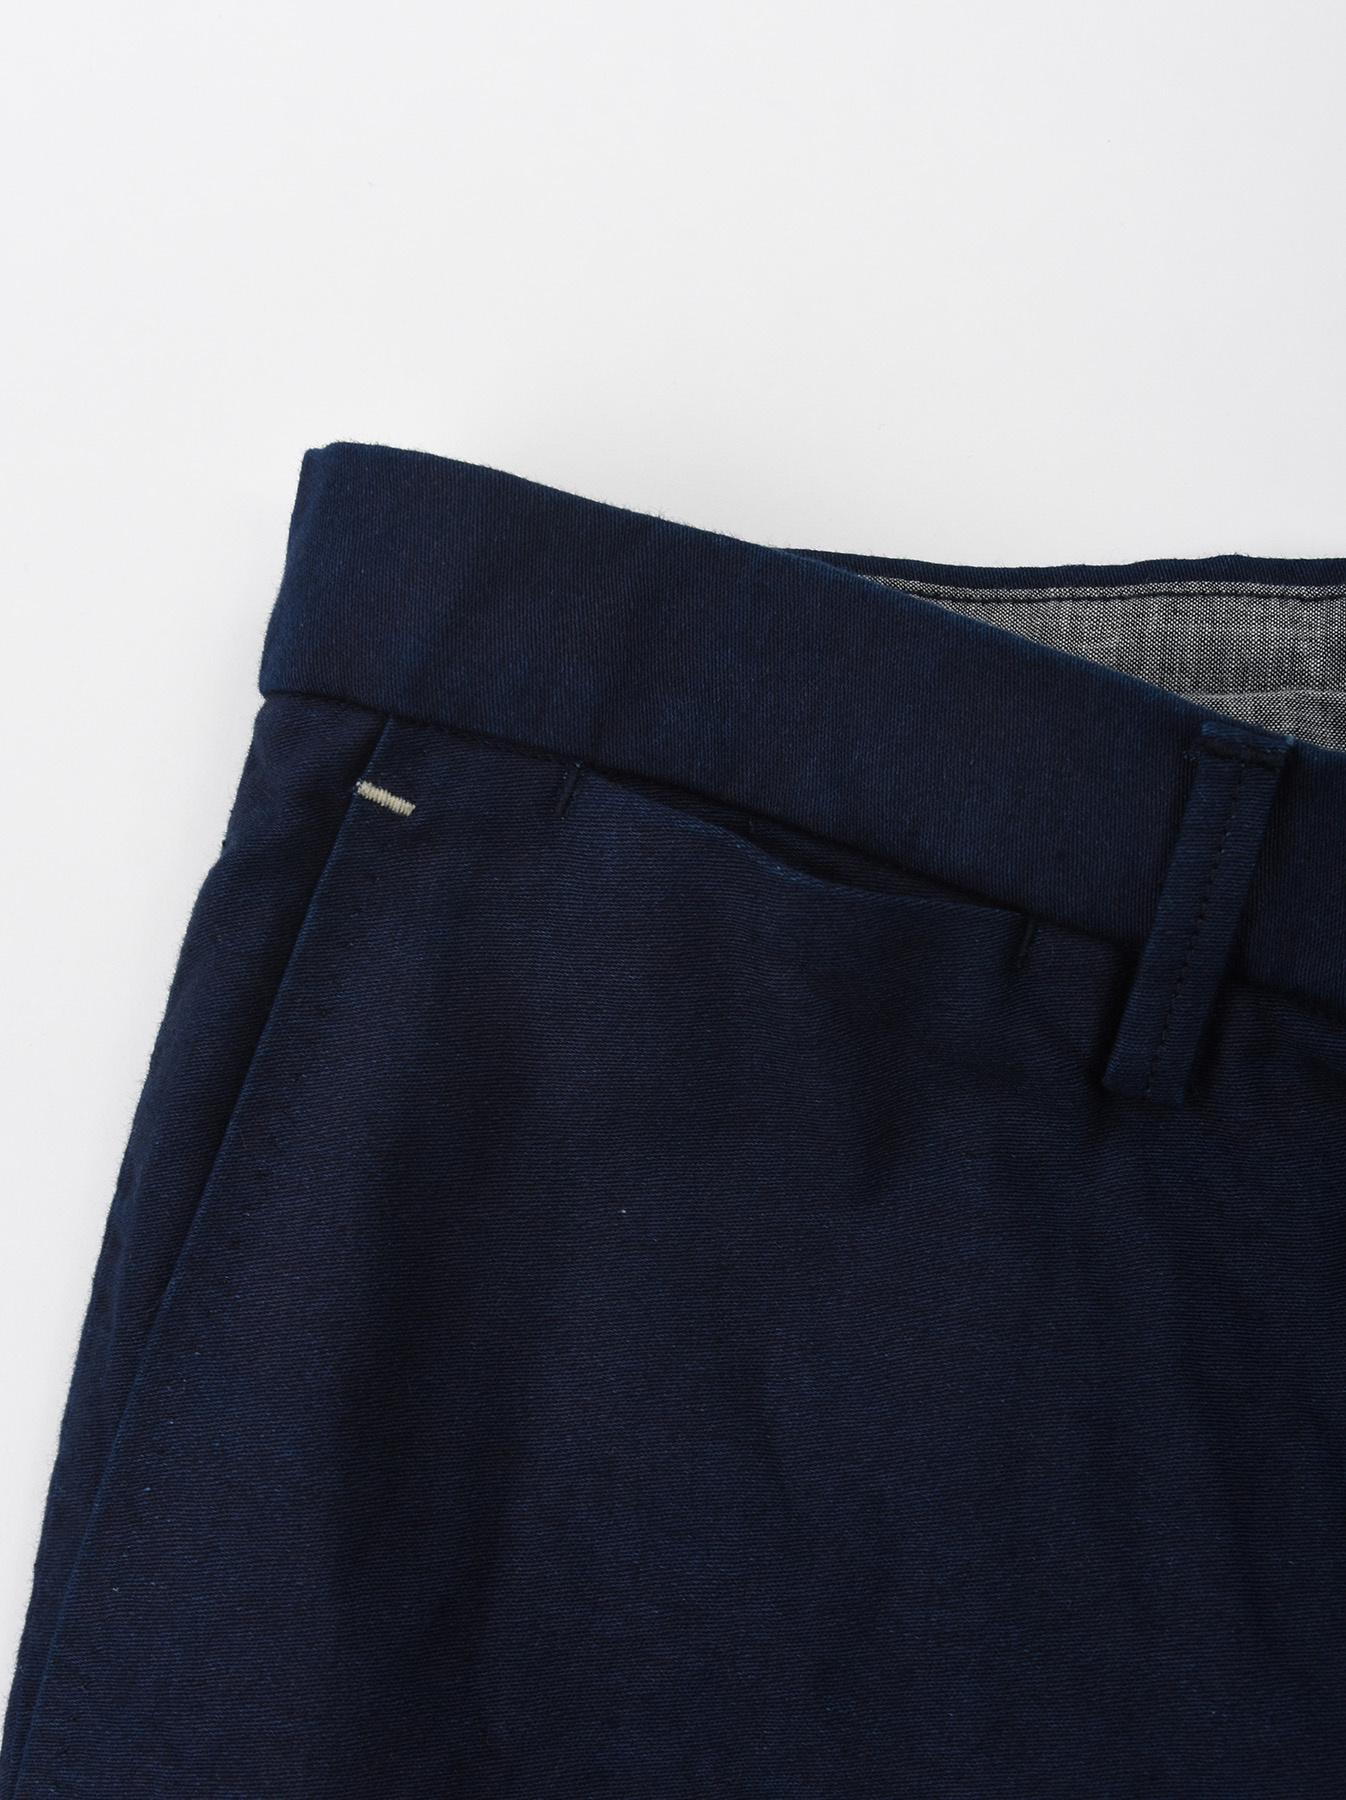 WH Indigo Mugi Yoko-shusi Soroe Pants-8